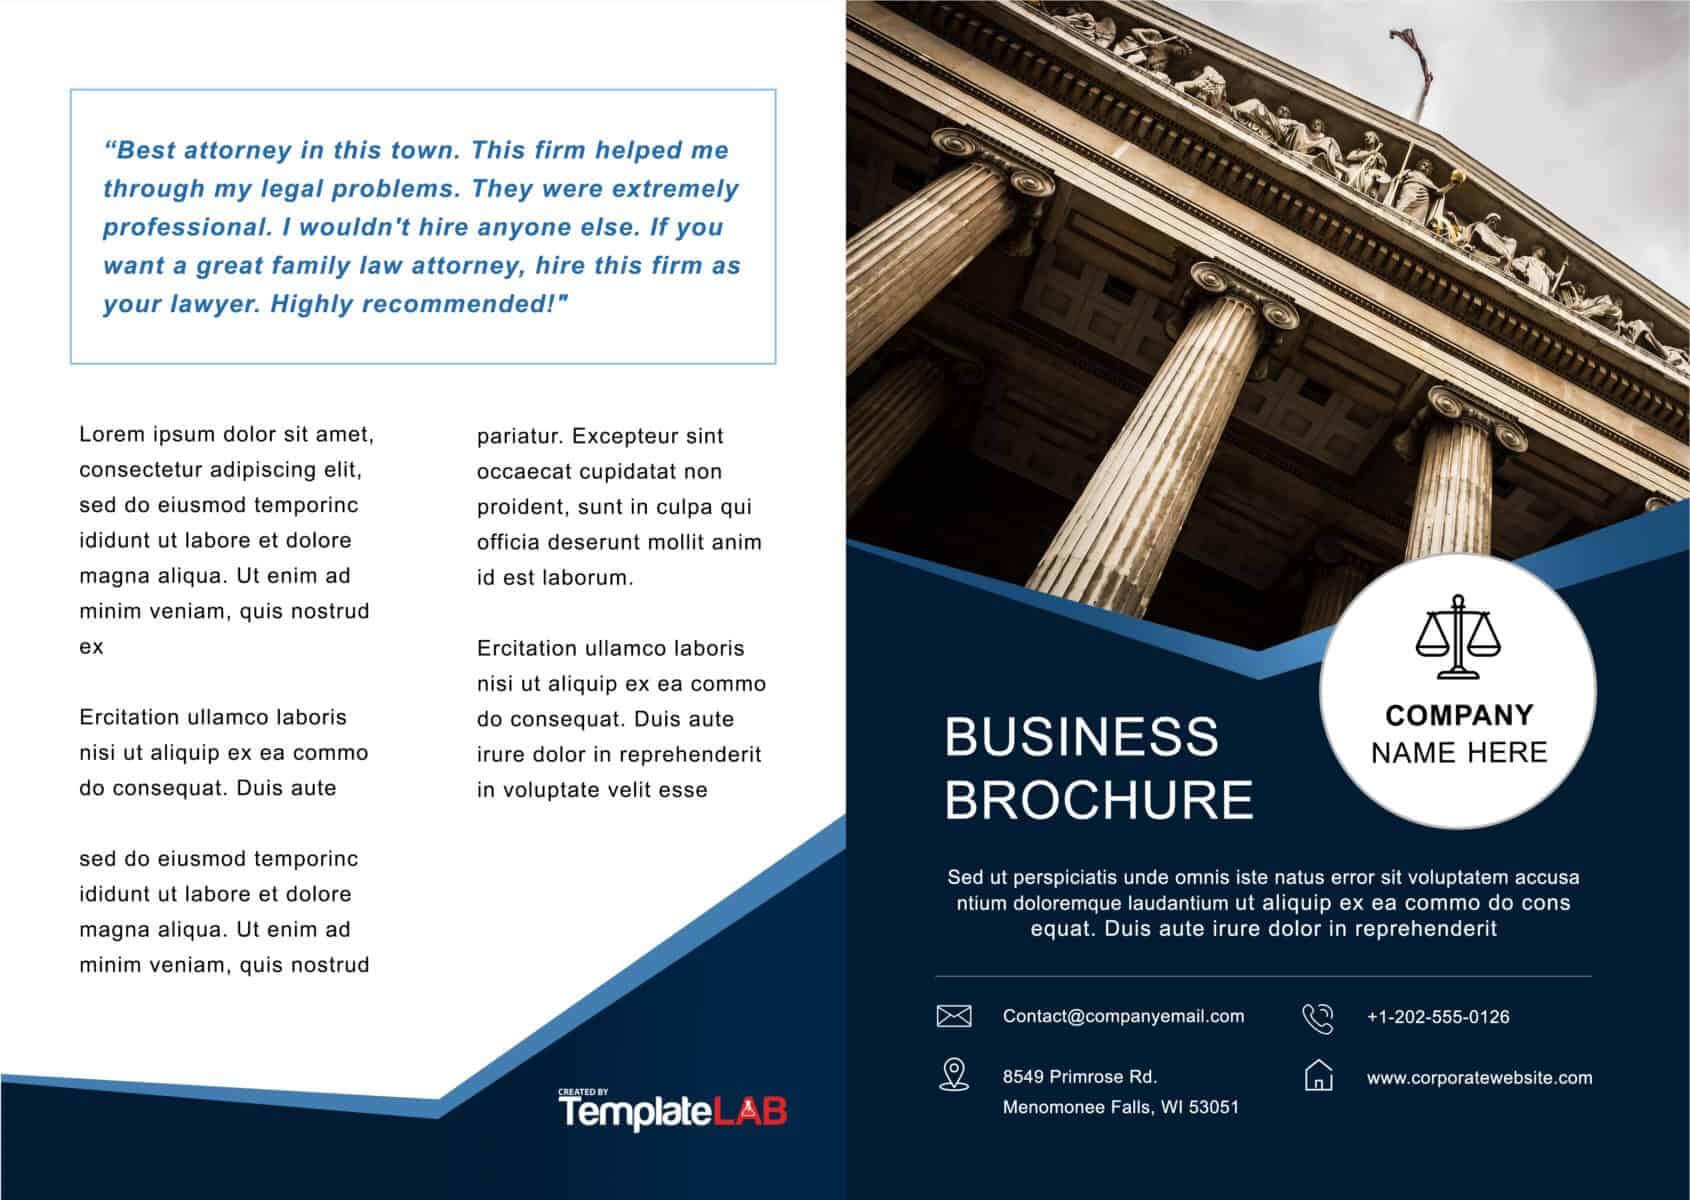 33 Free Brochure Templates (Word + Pdf) ᐅ Templatelab Inside Online Brochure Template Free